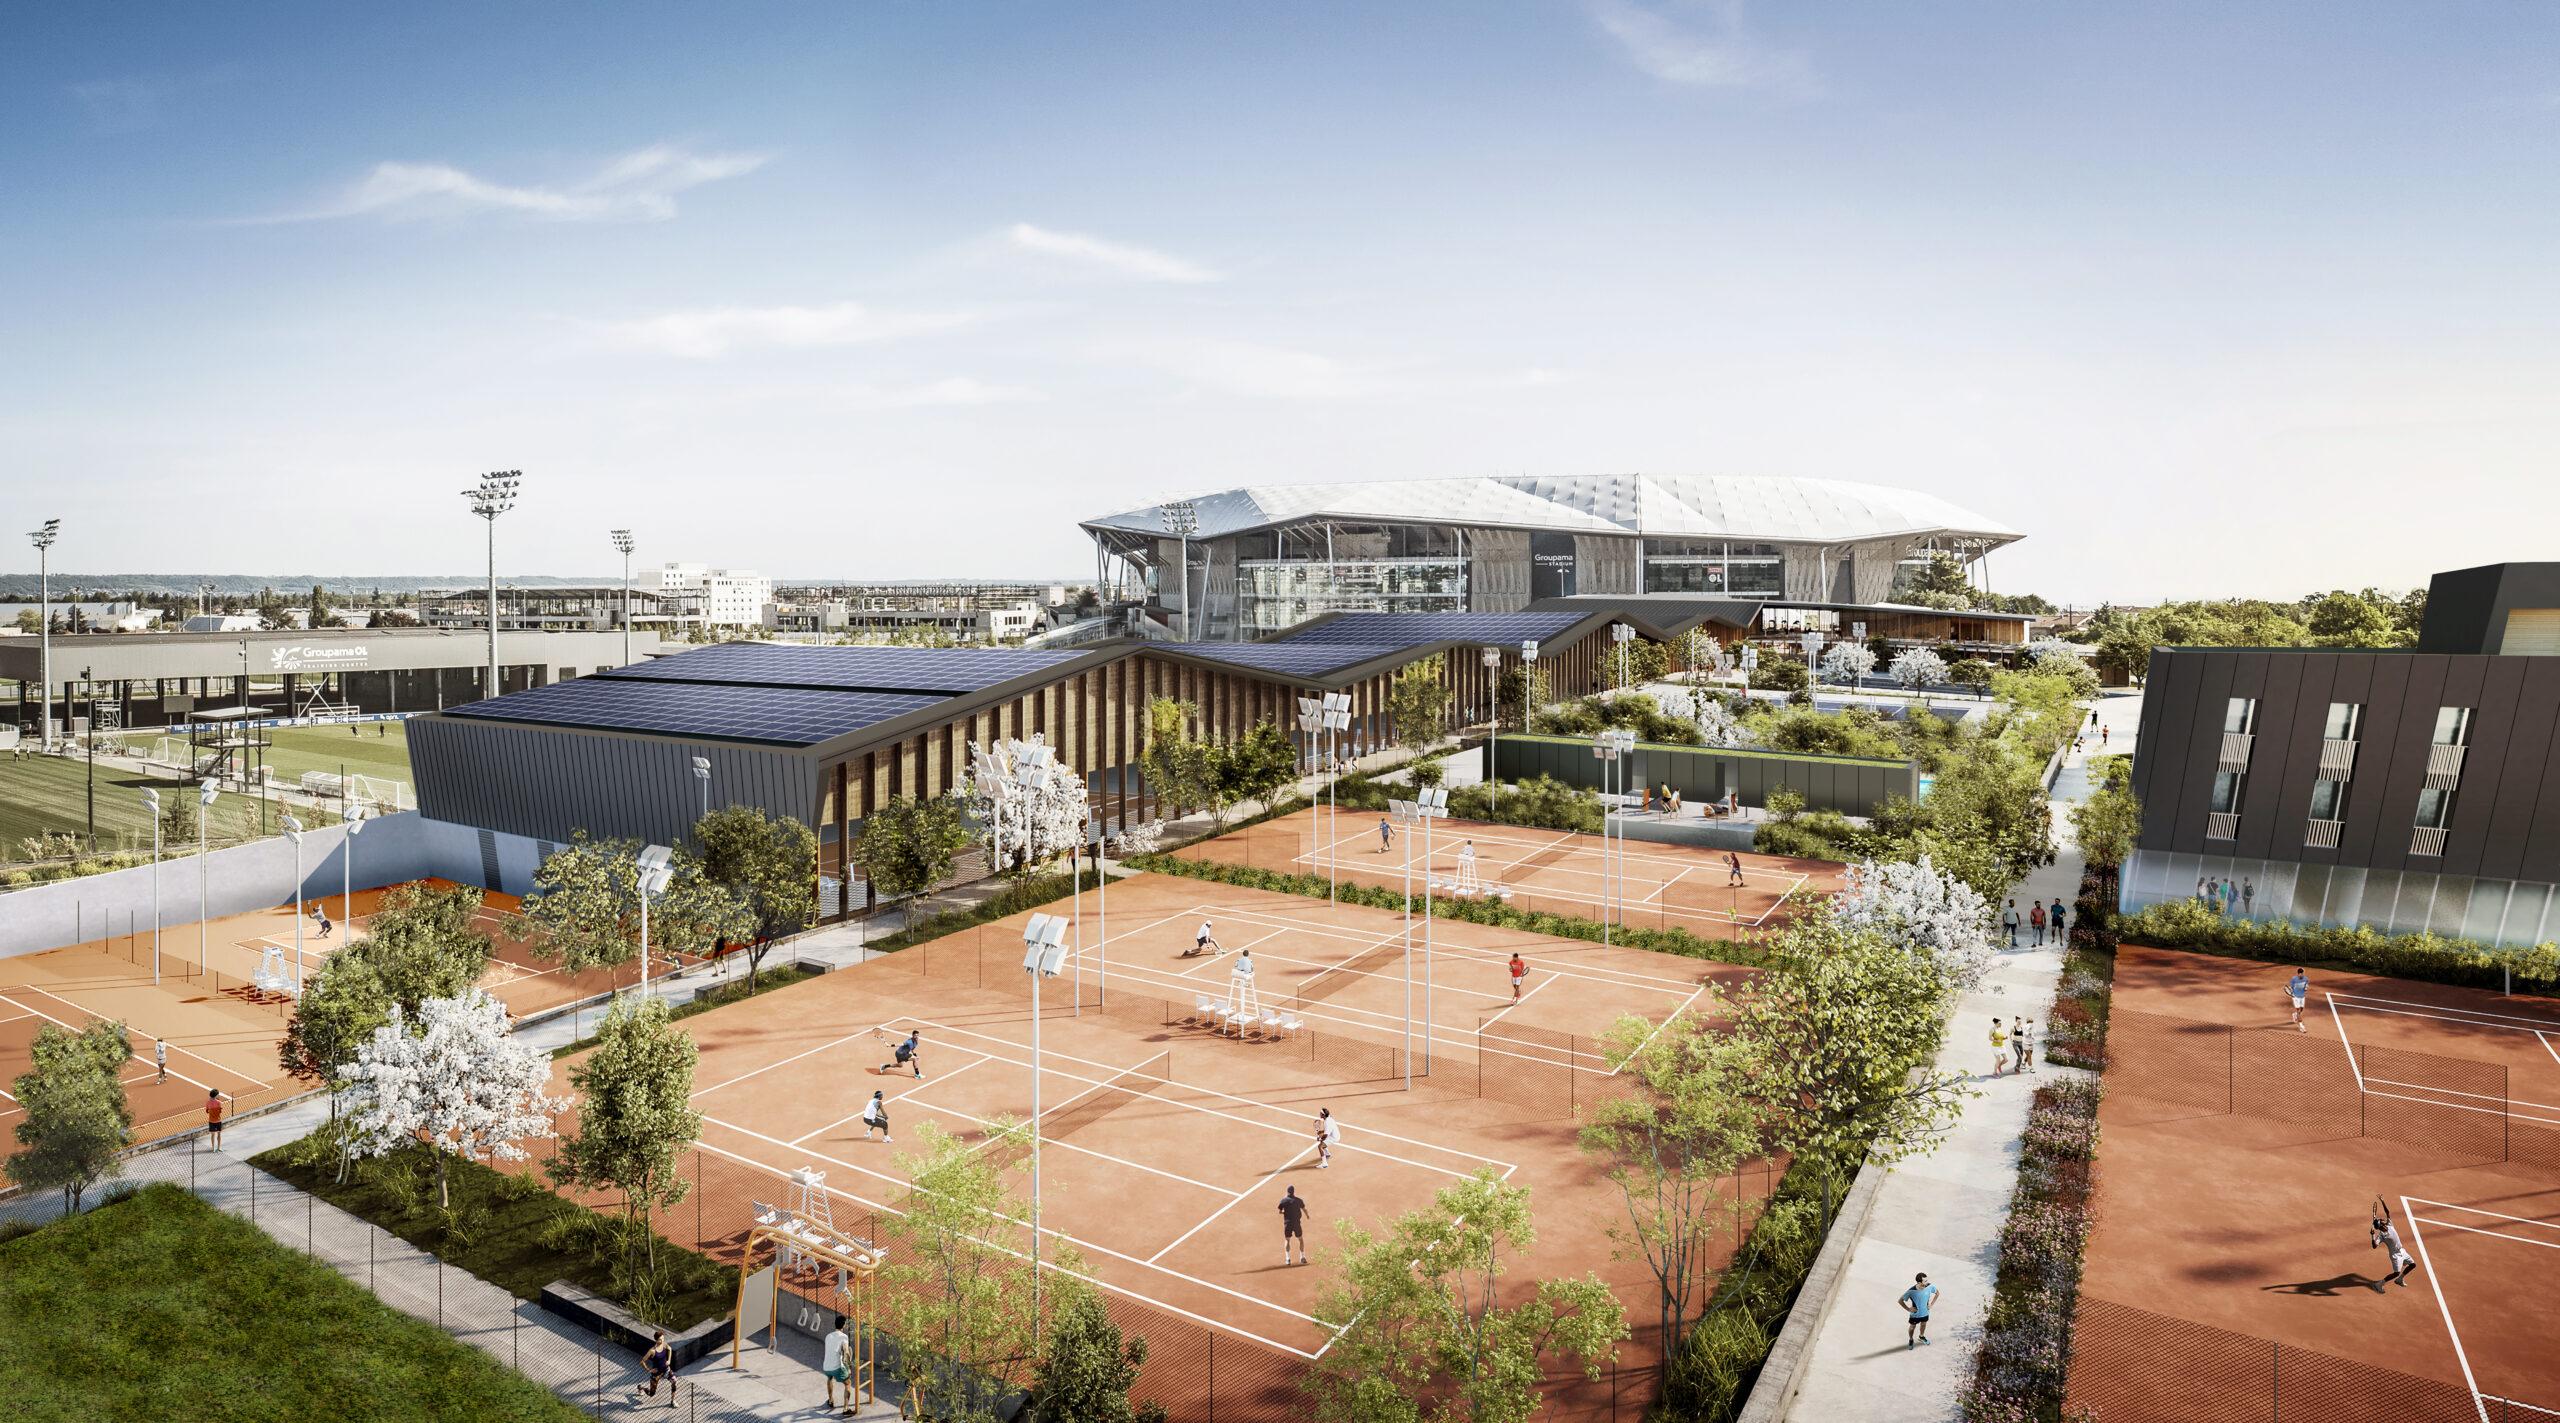 Académie de tennis OL